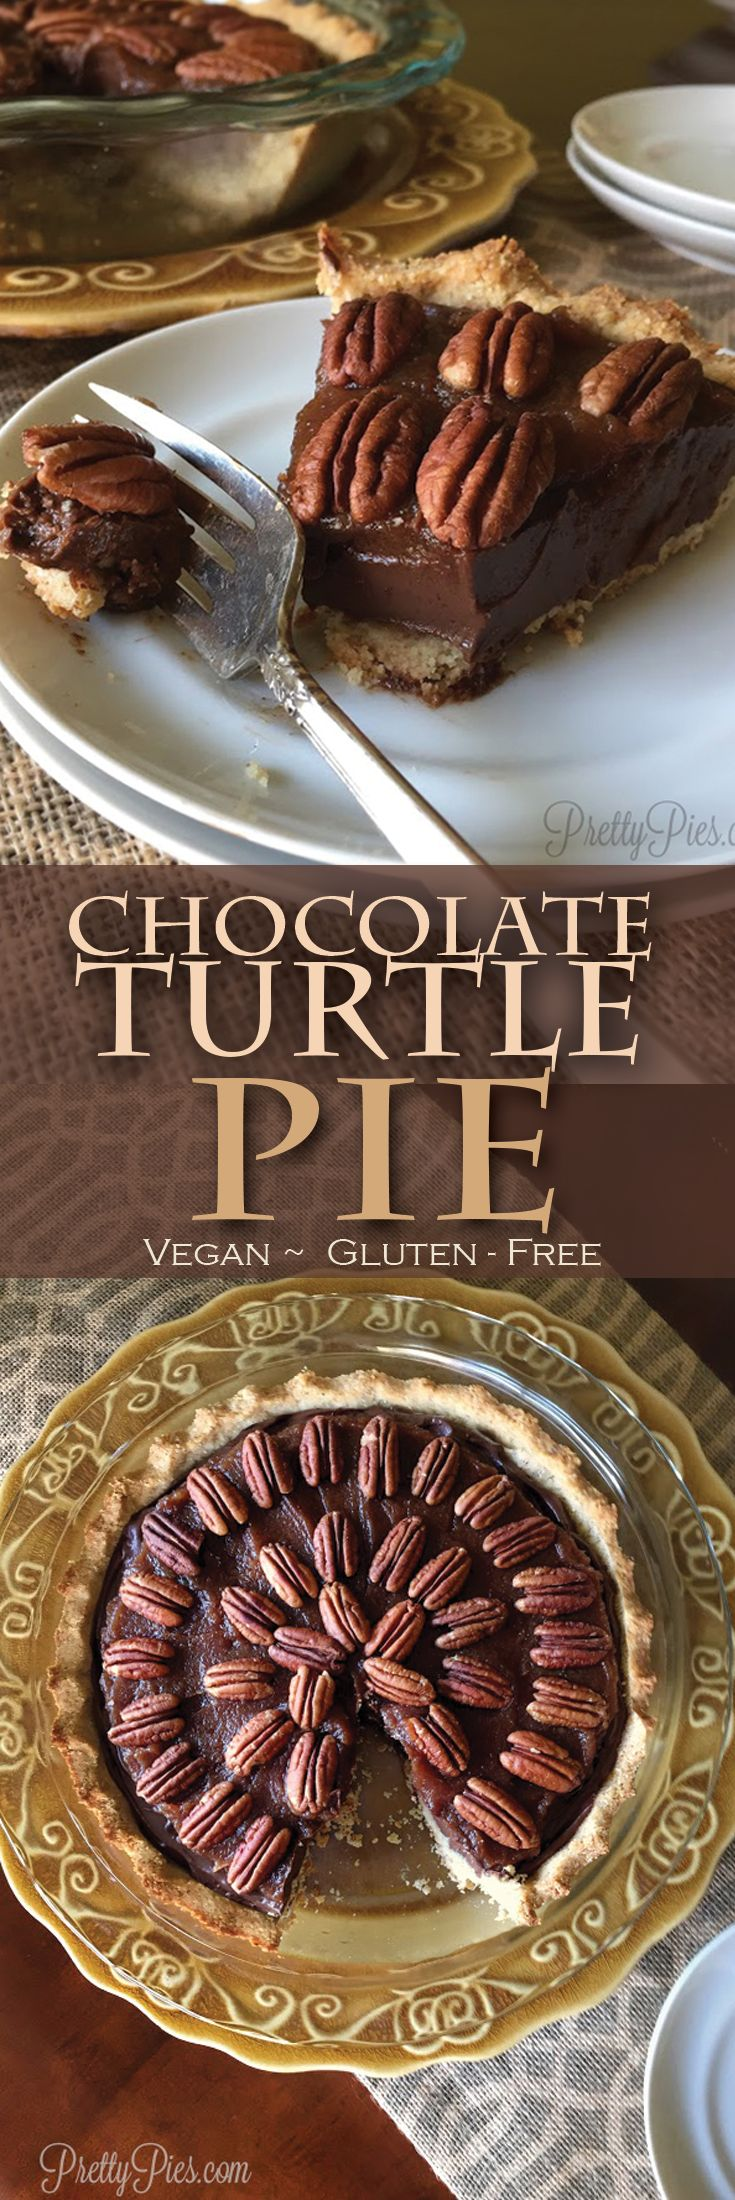 Best 20+ Chocolate turtle cakes ideas on Pinterest | Chocolate ...